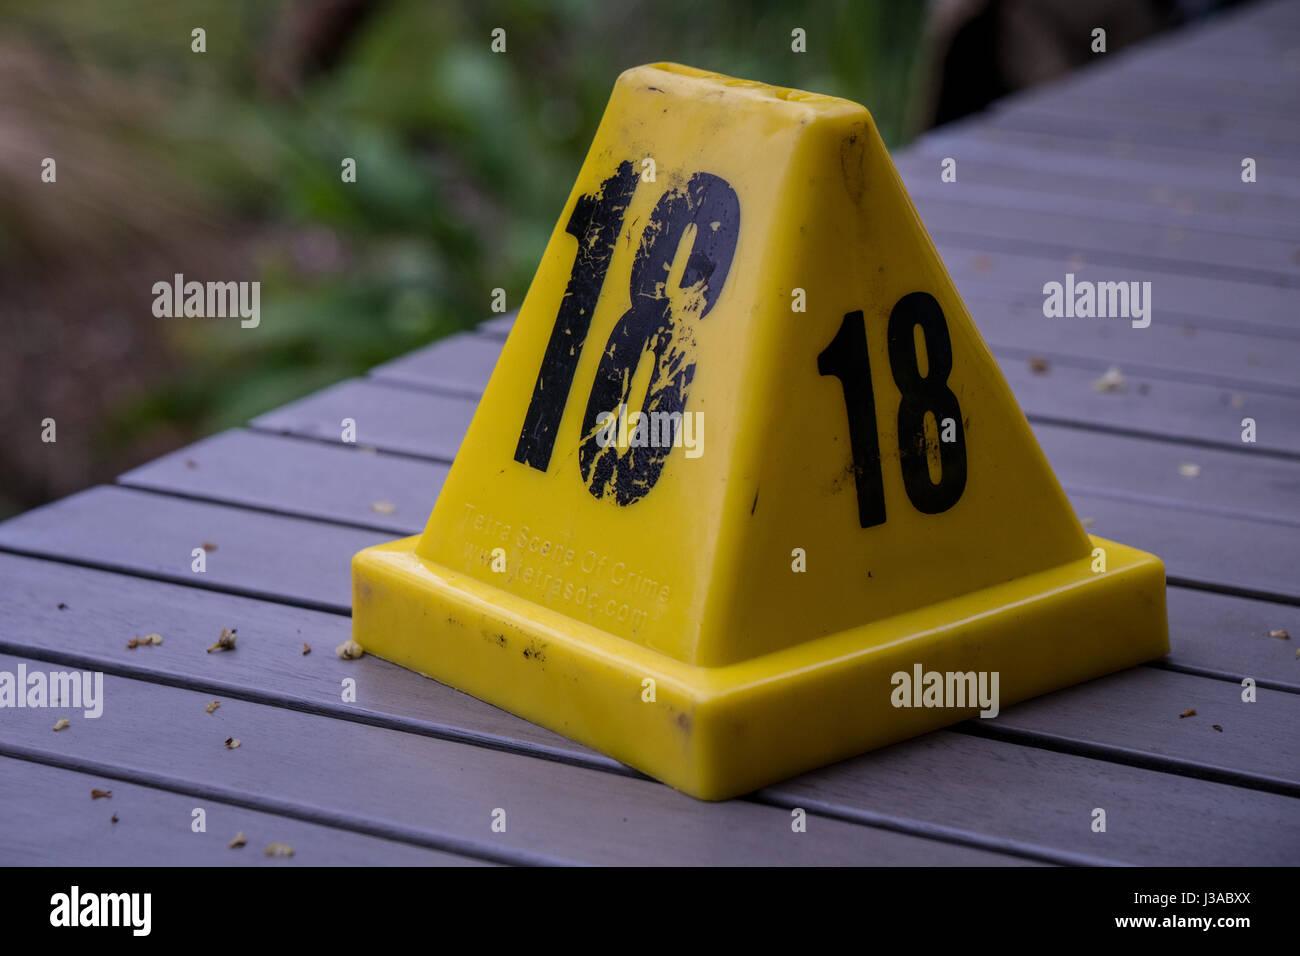 Crime Scene photos - Stock Image